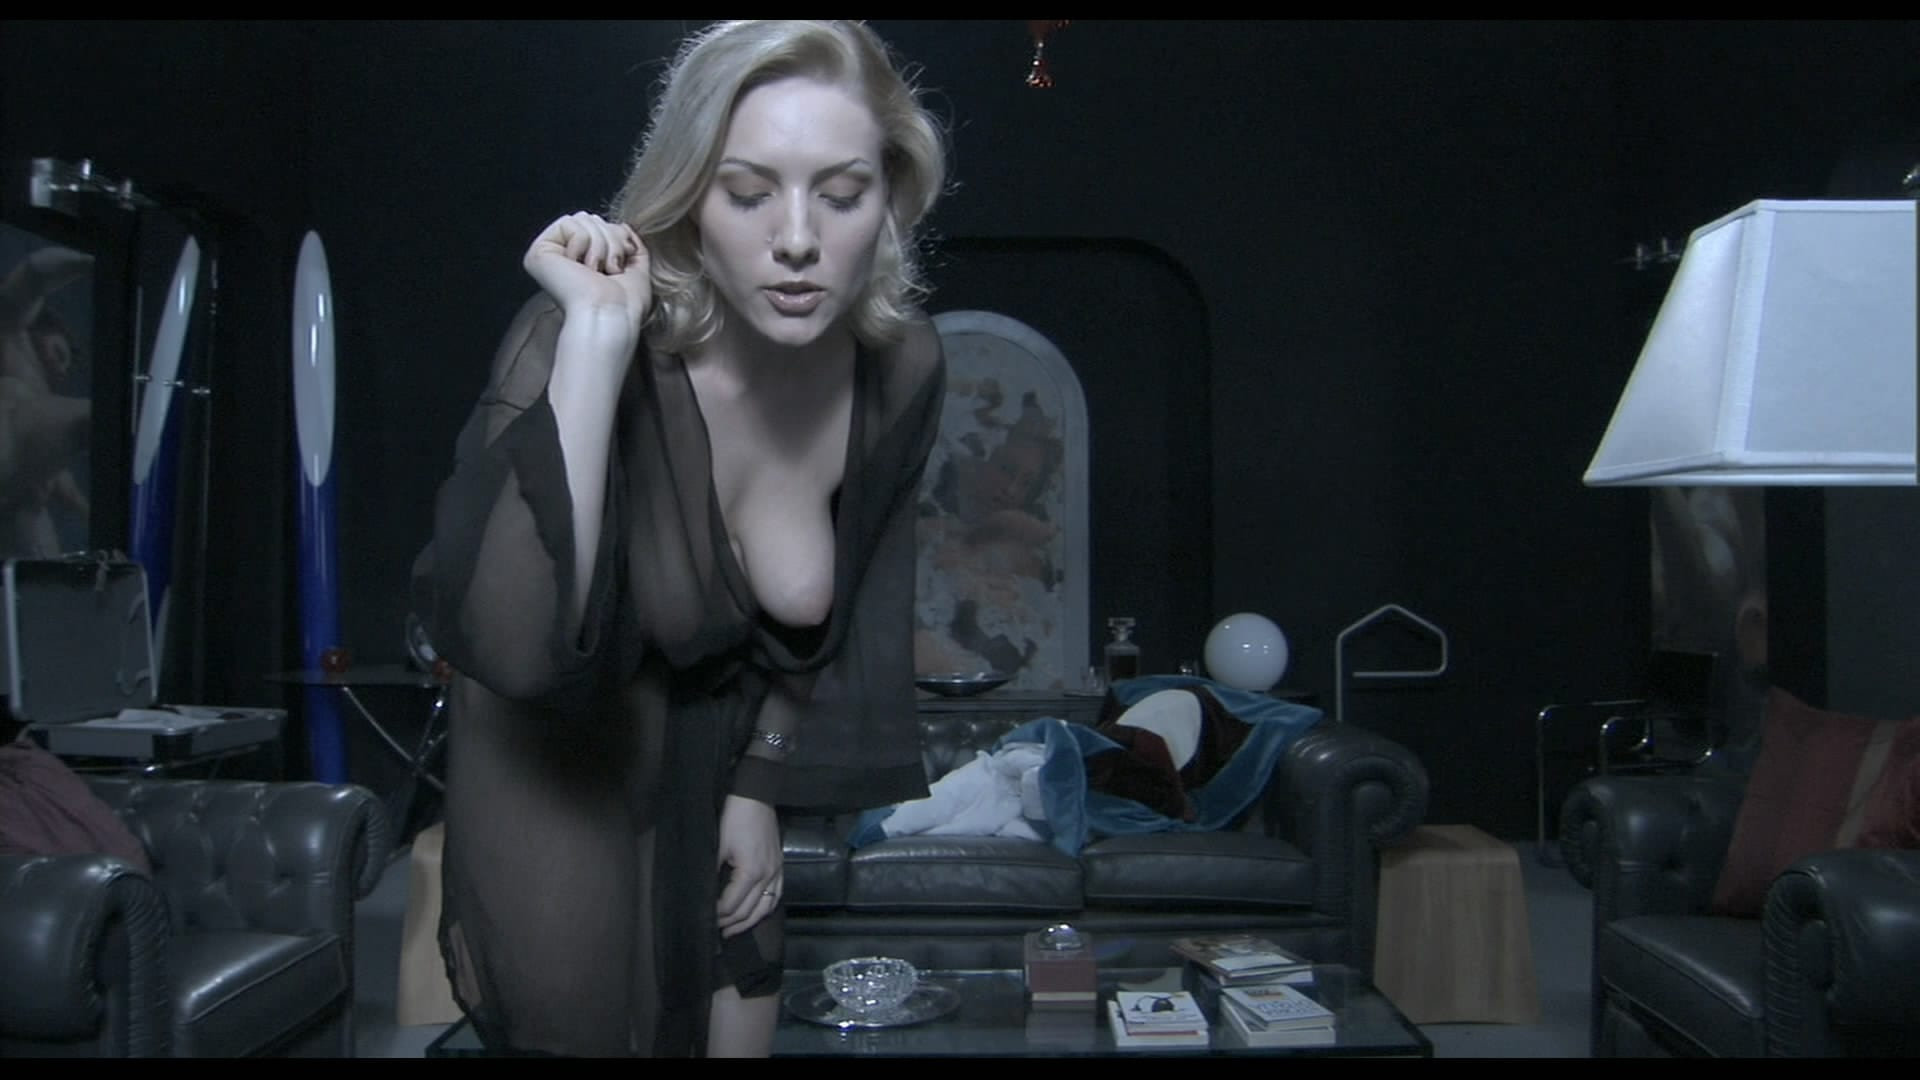 eroticheskoe-foto-penisa